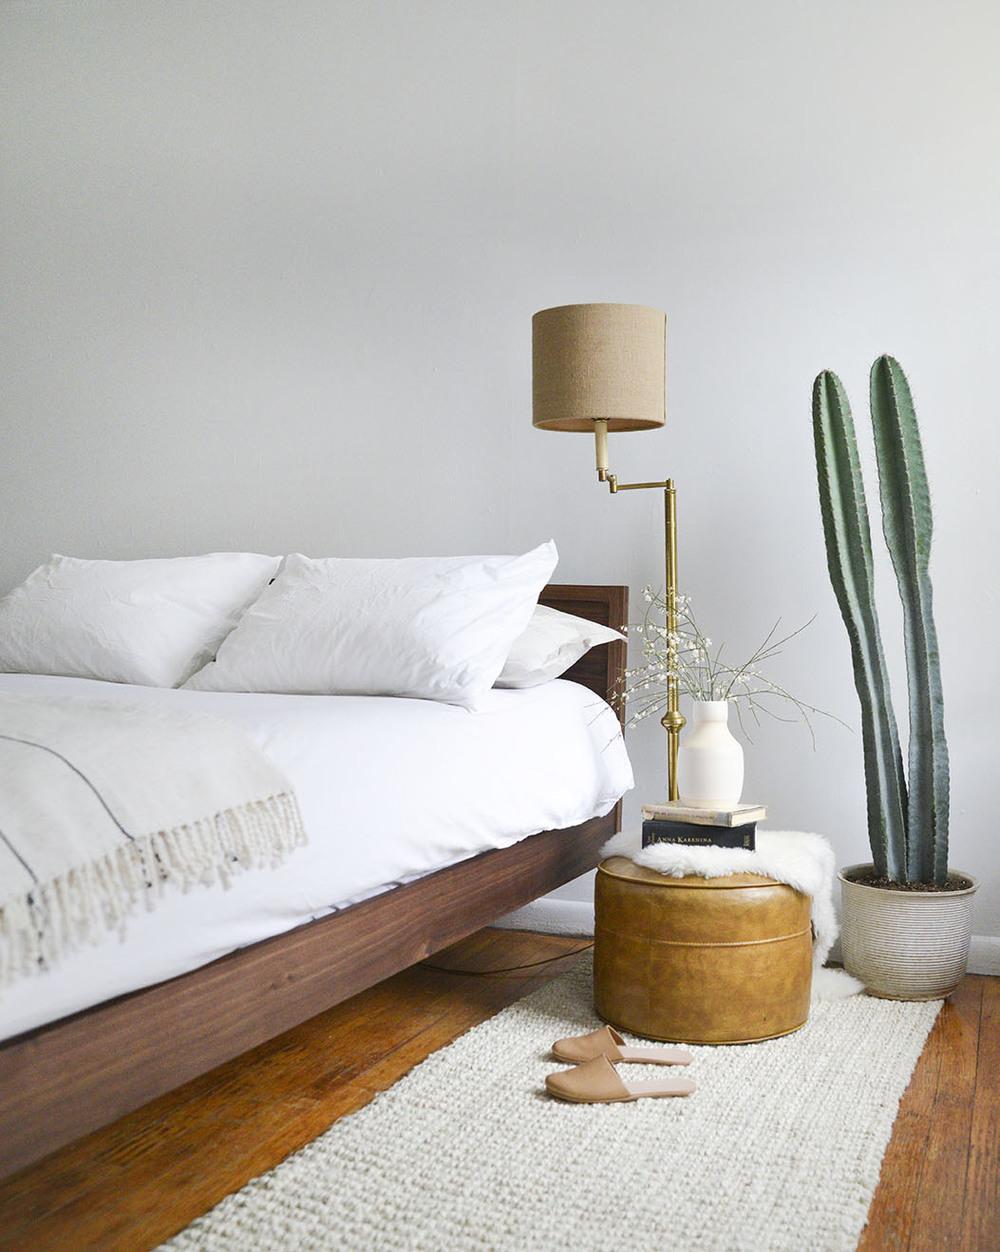 local-creative-hedge-house-furniture-parachute-home-design-28.jpg